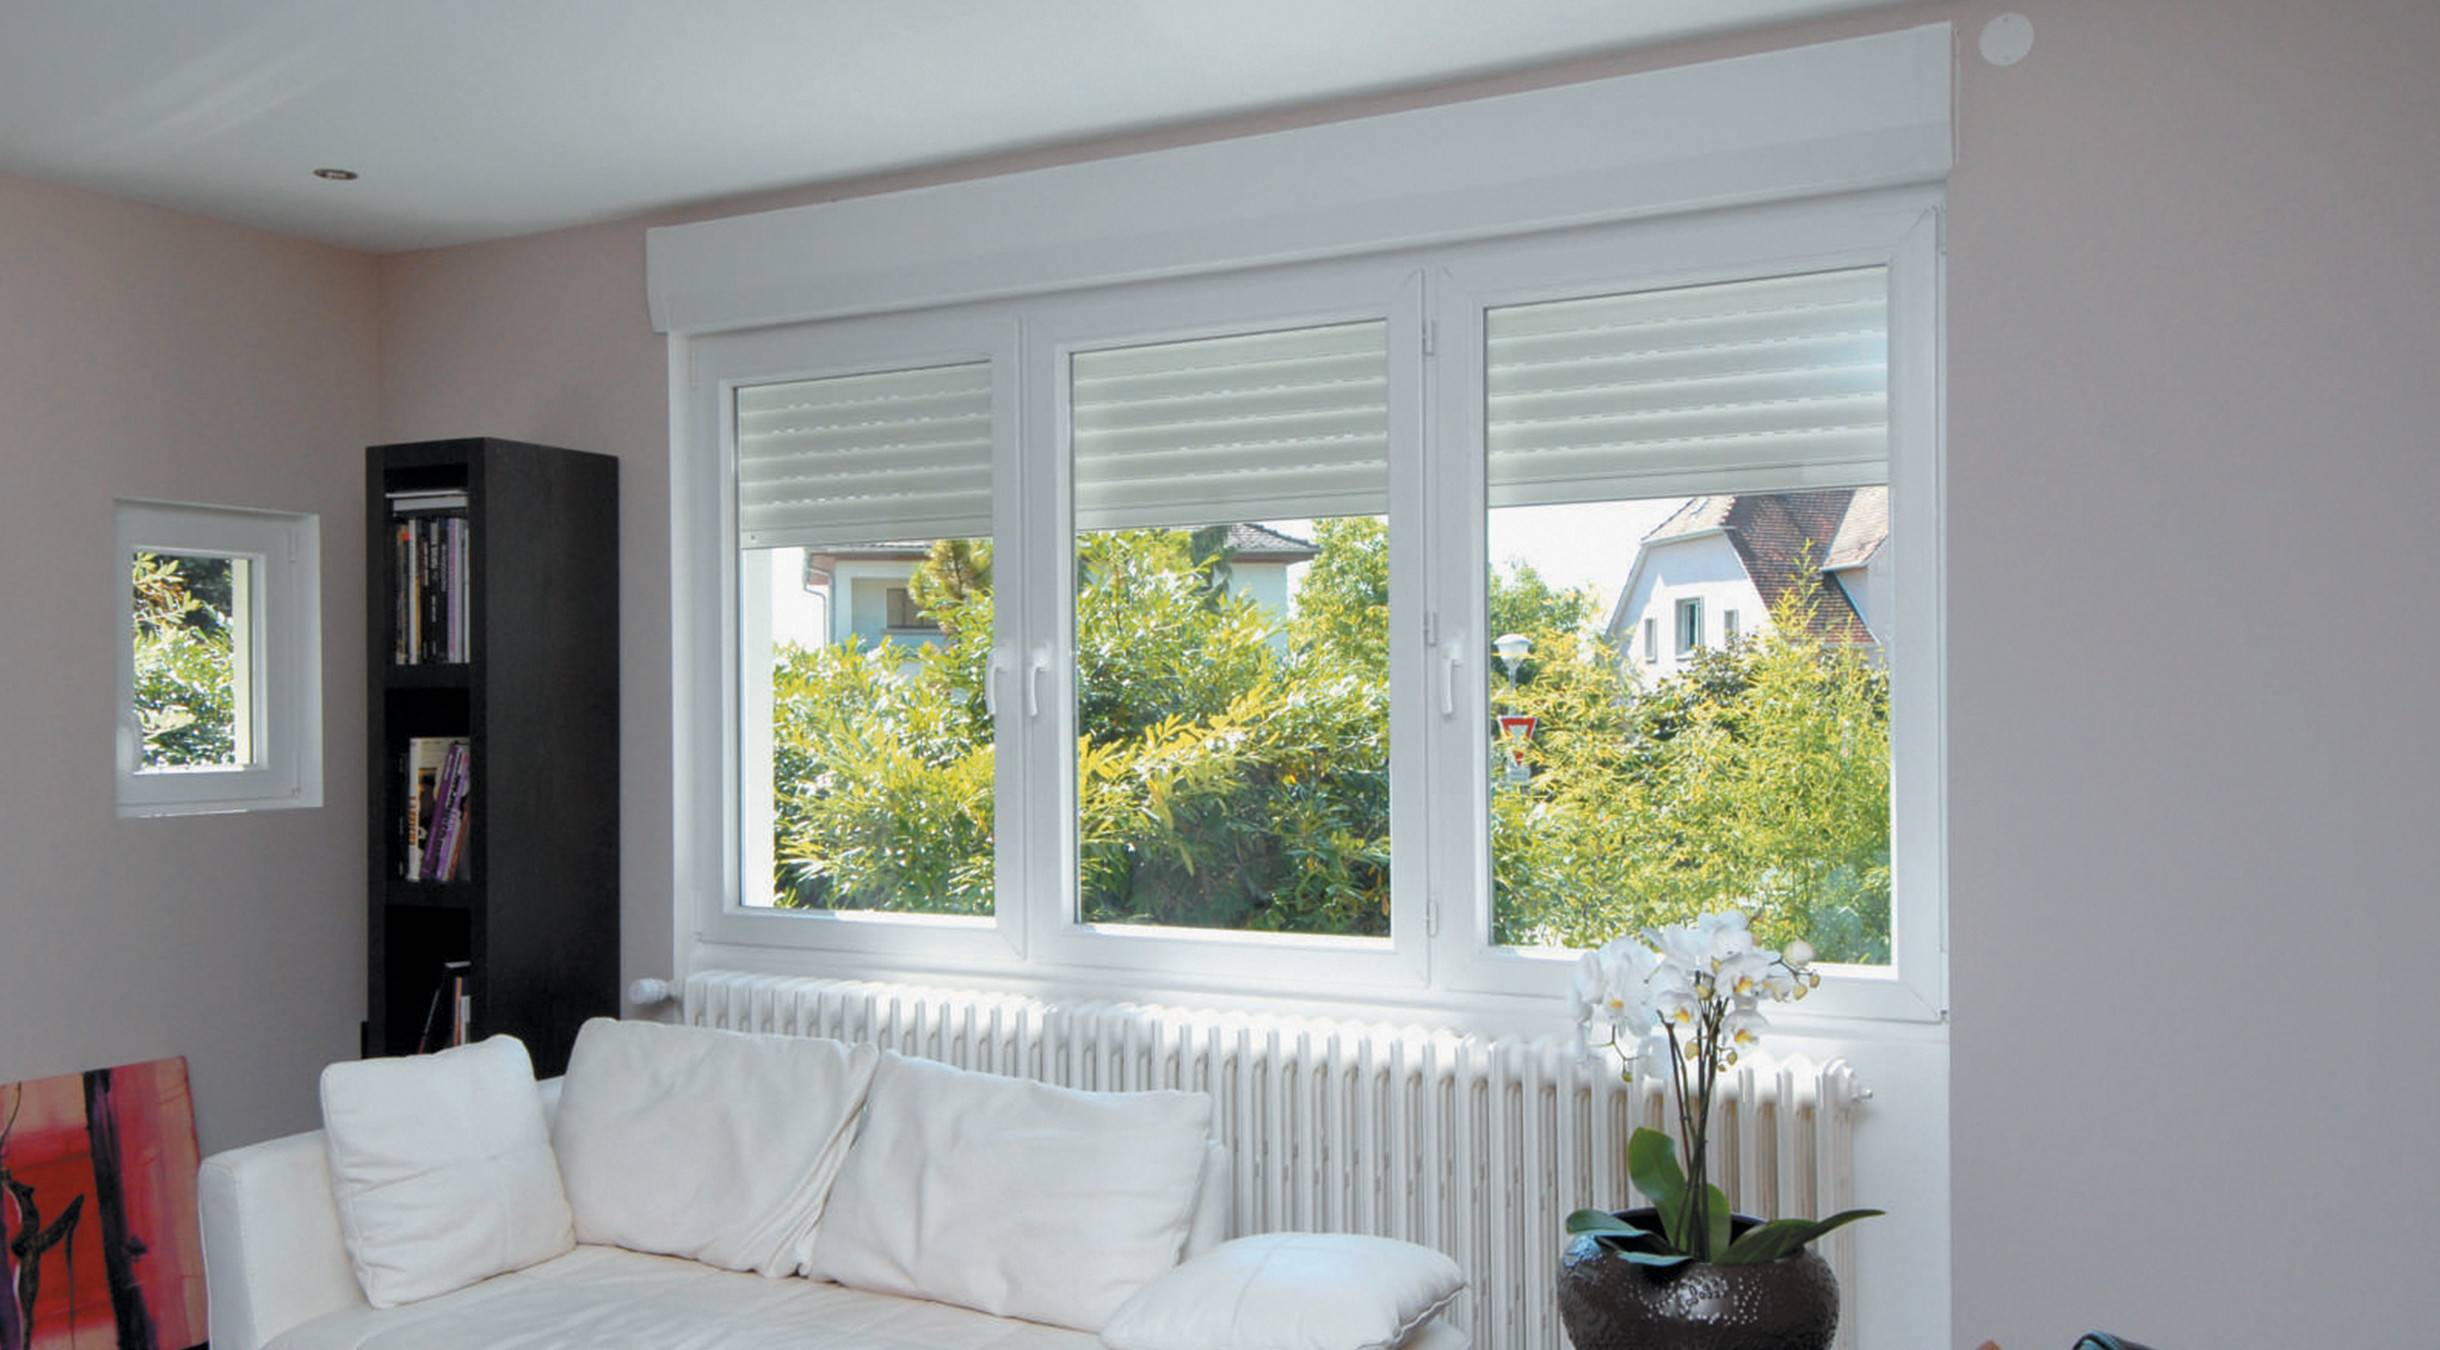 volets roulants tryba volets pvc aluminium. Black Bedroom Furniture Sets. Home Design Ideas